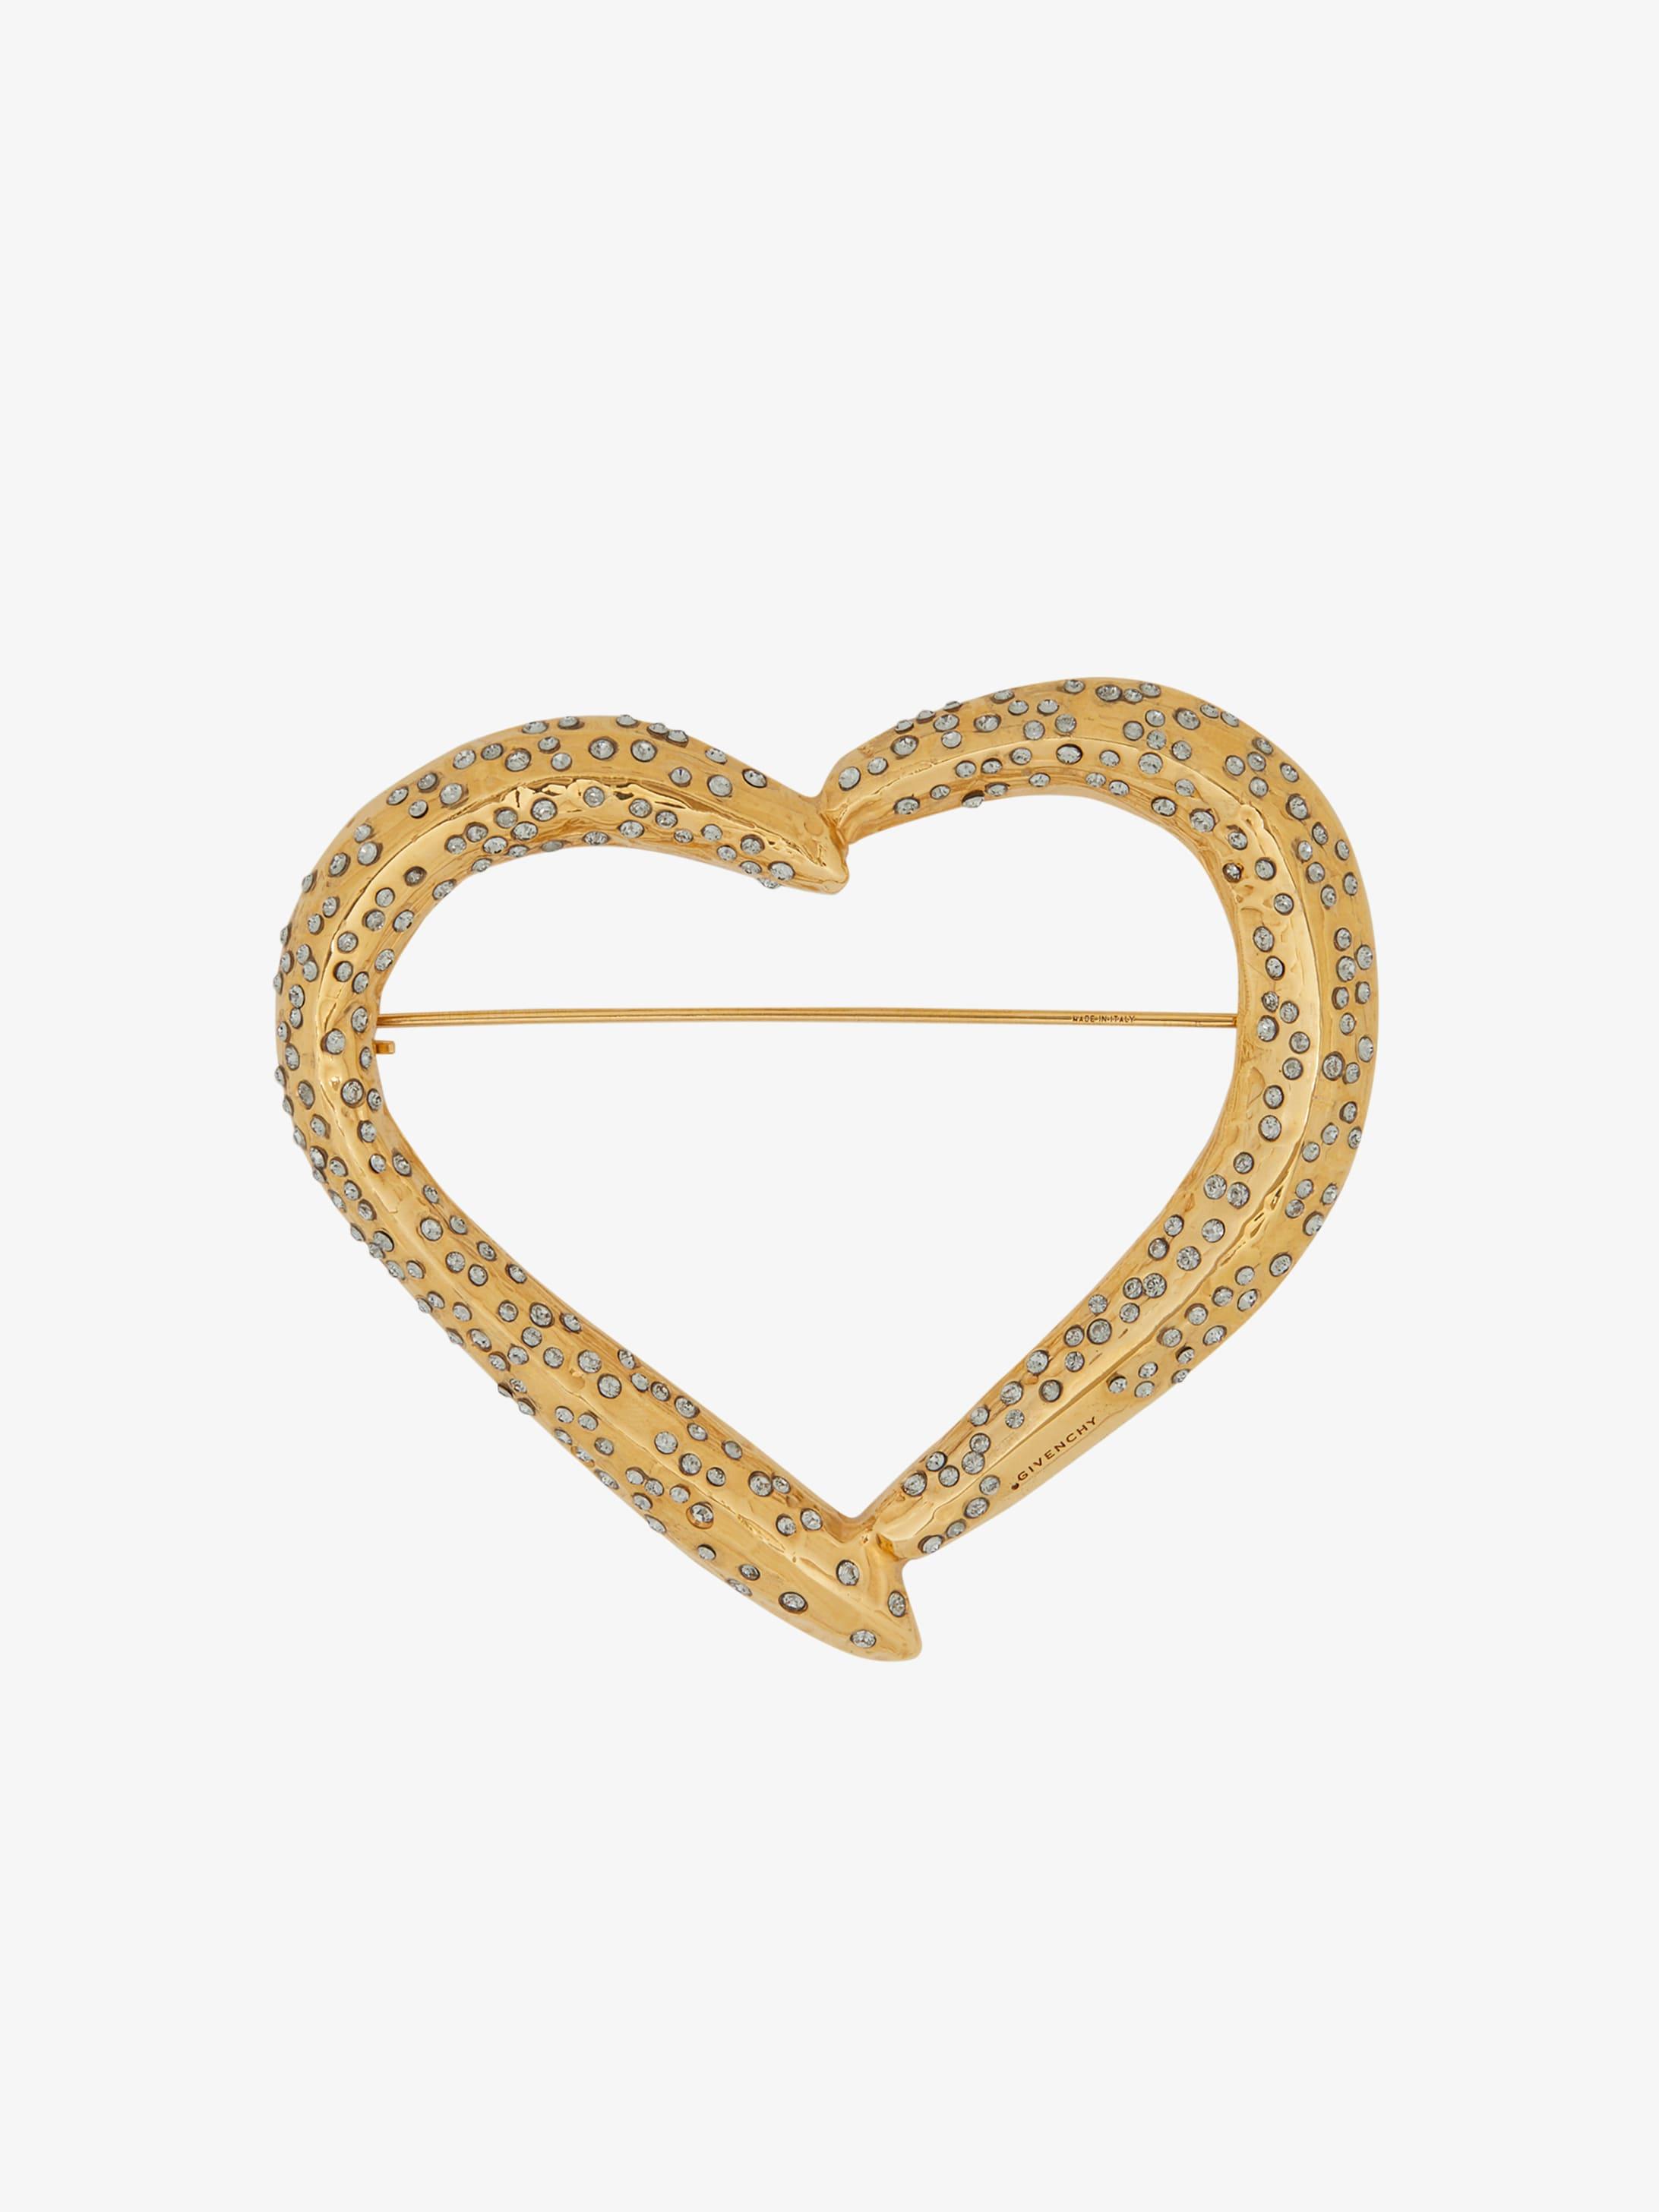 Heart Crystals paved brooch